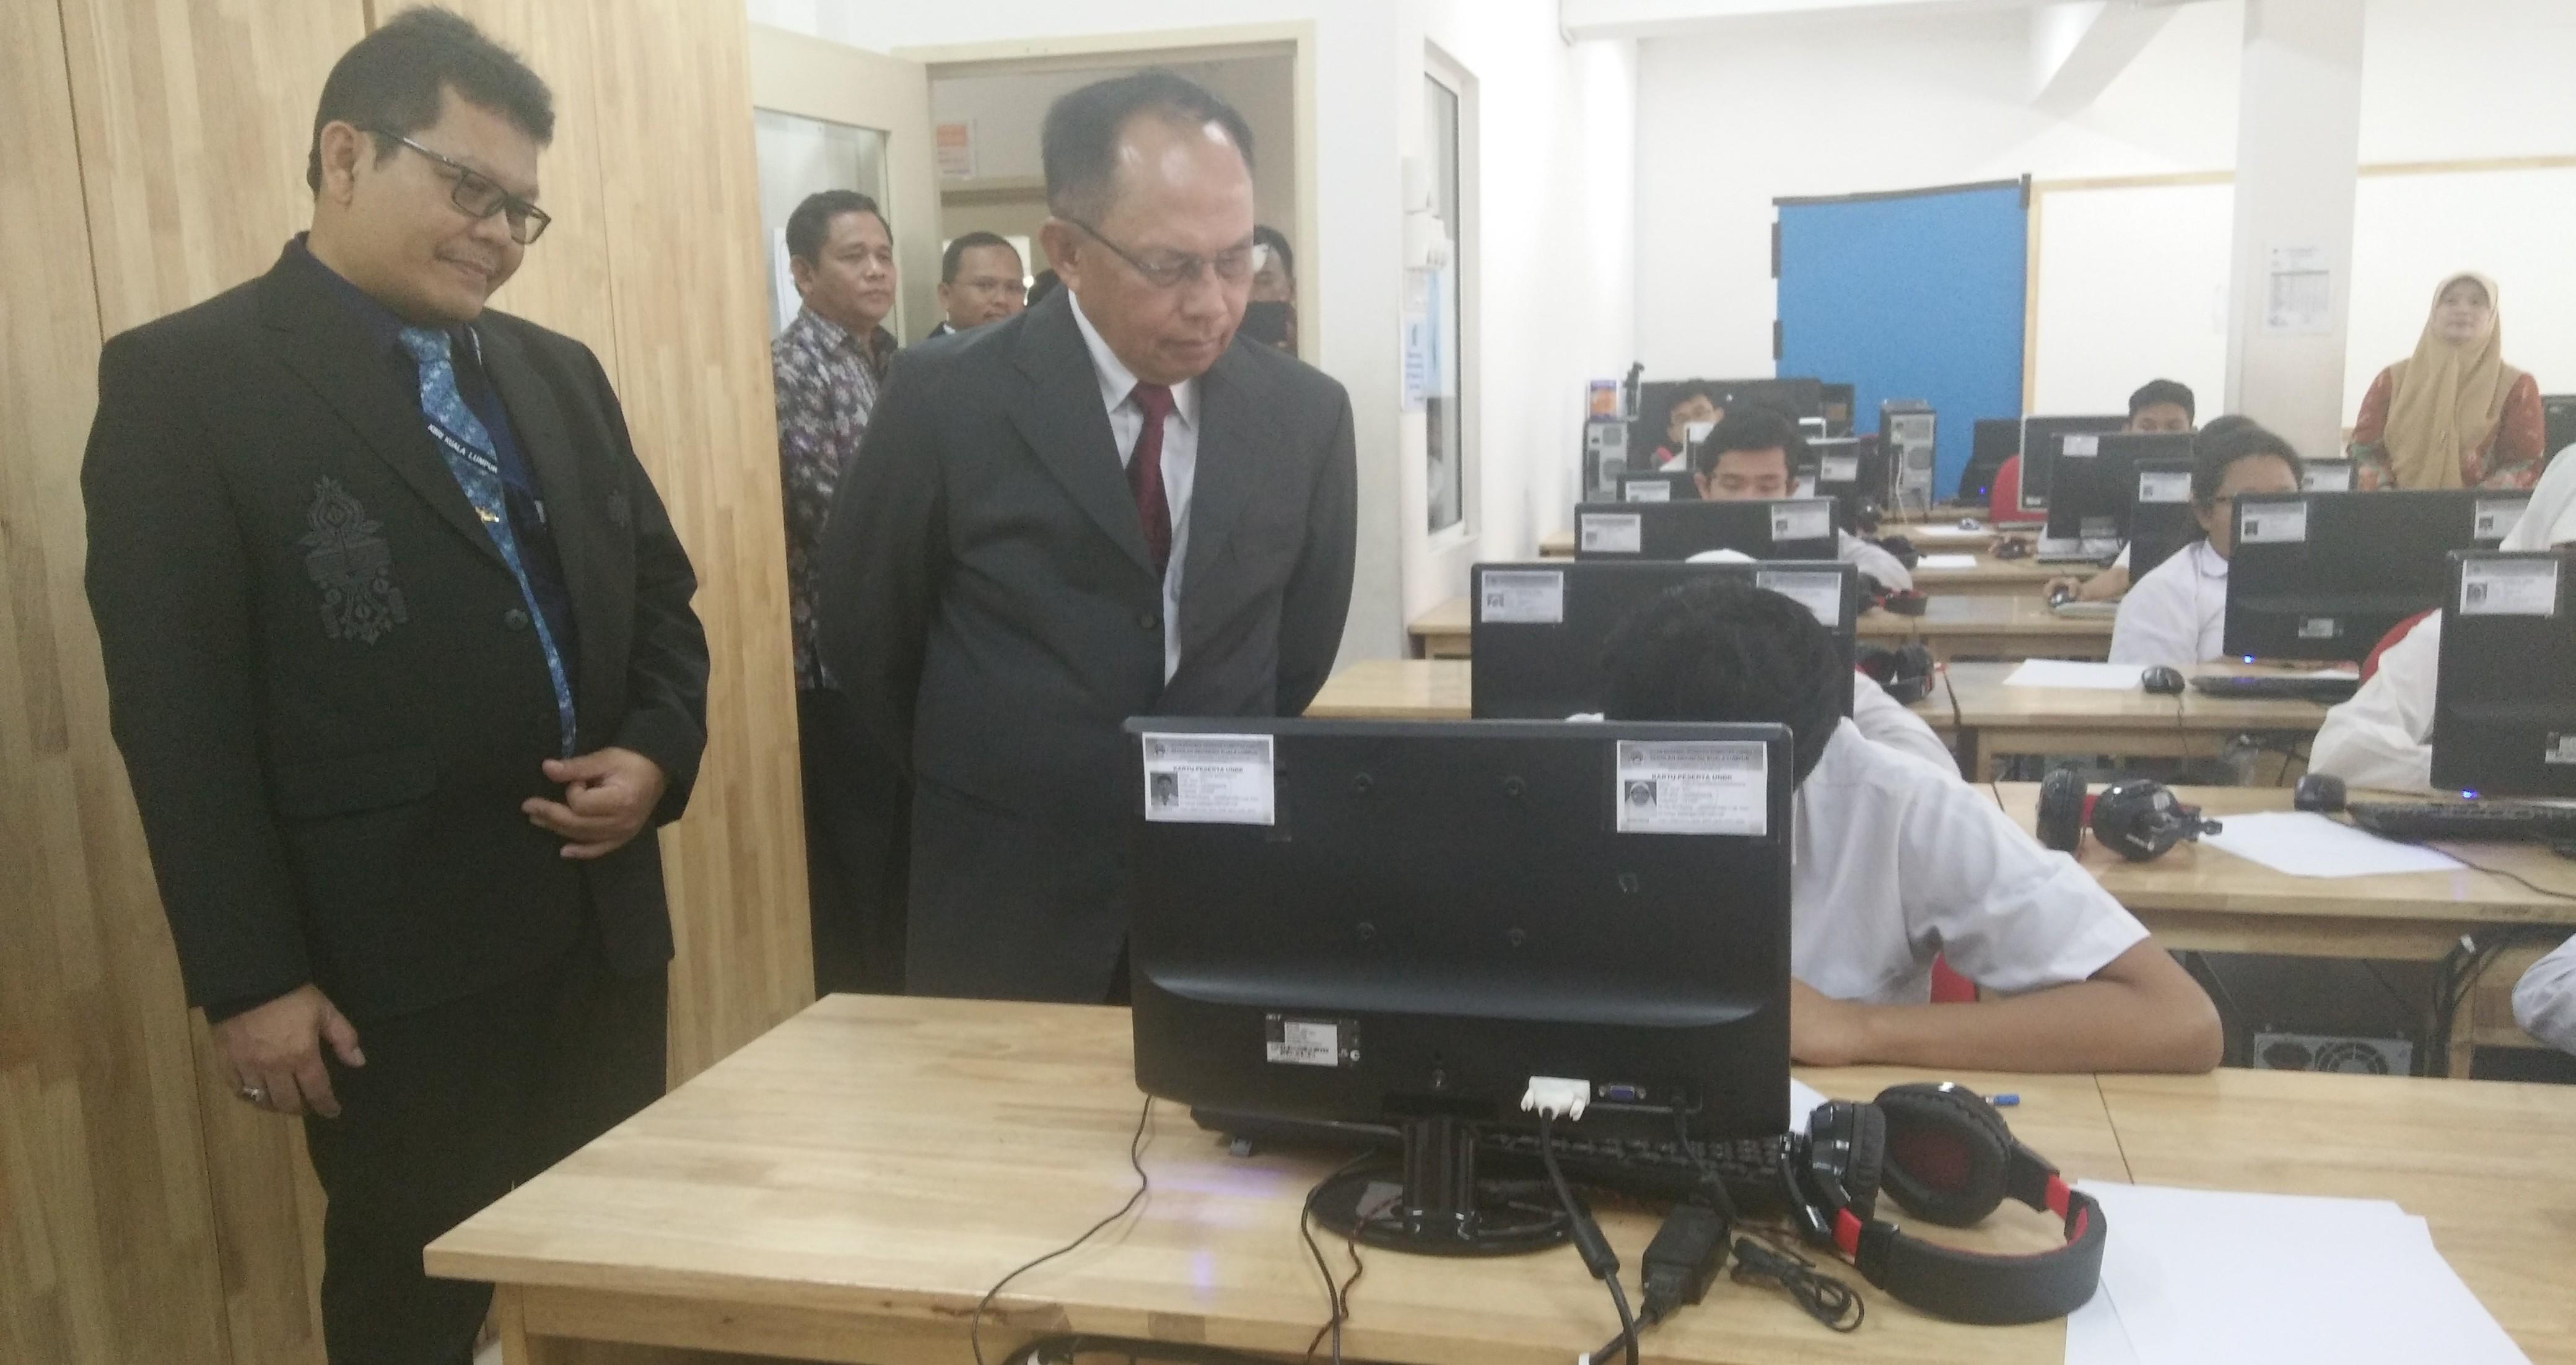 Dubes Herman Prayitno Tinjau Pelaksaan UNBK di SIKL